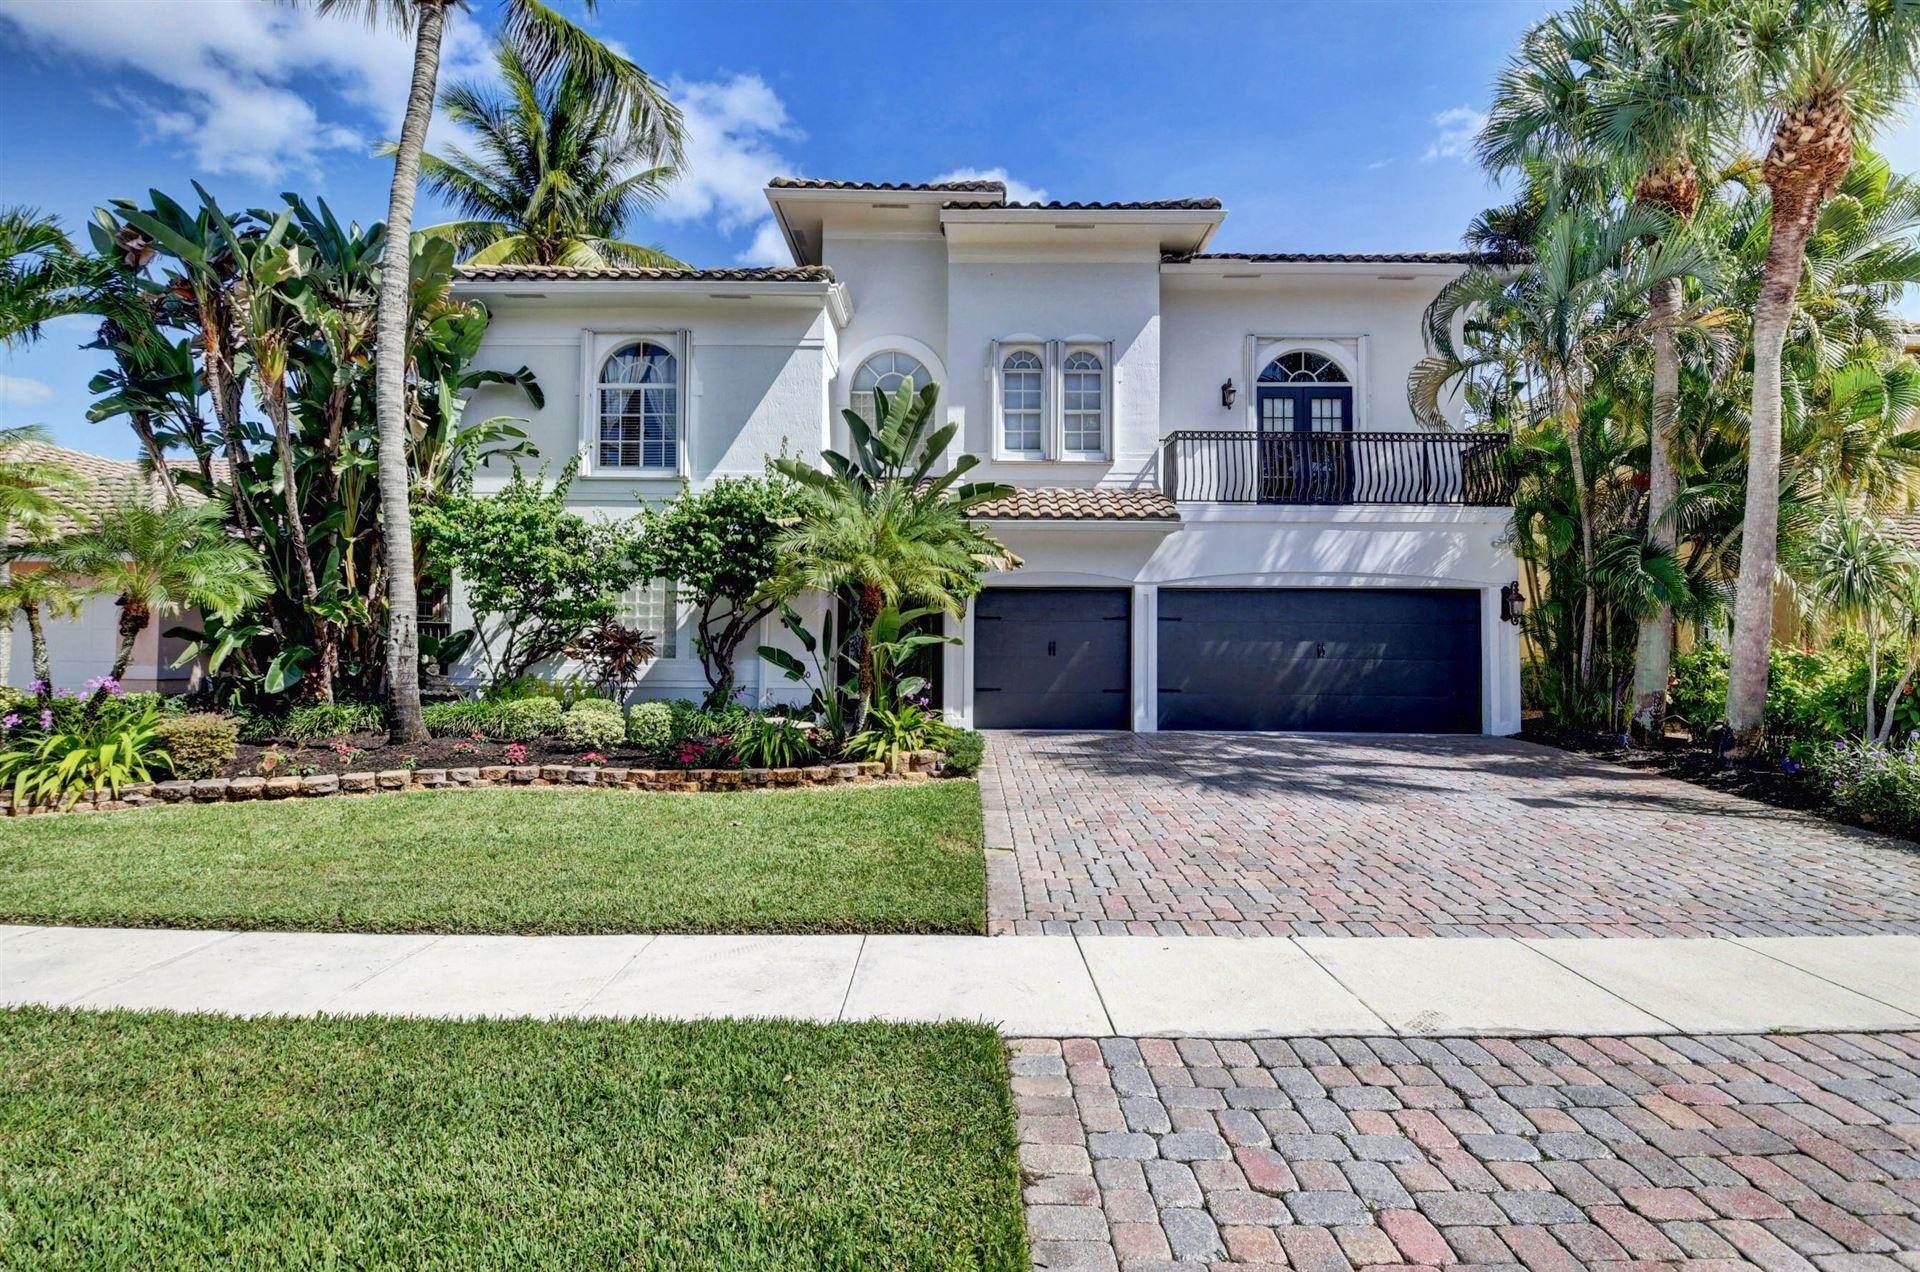 9760 Coronado Lake Drive, Boynton Beach, FL 33437 - MLS#: RX-10754875